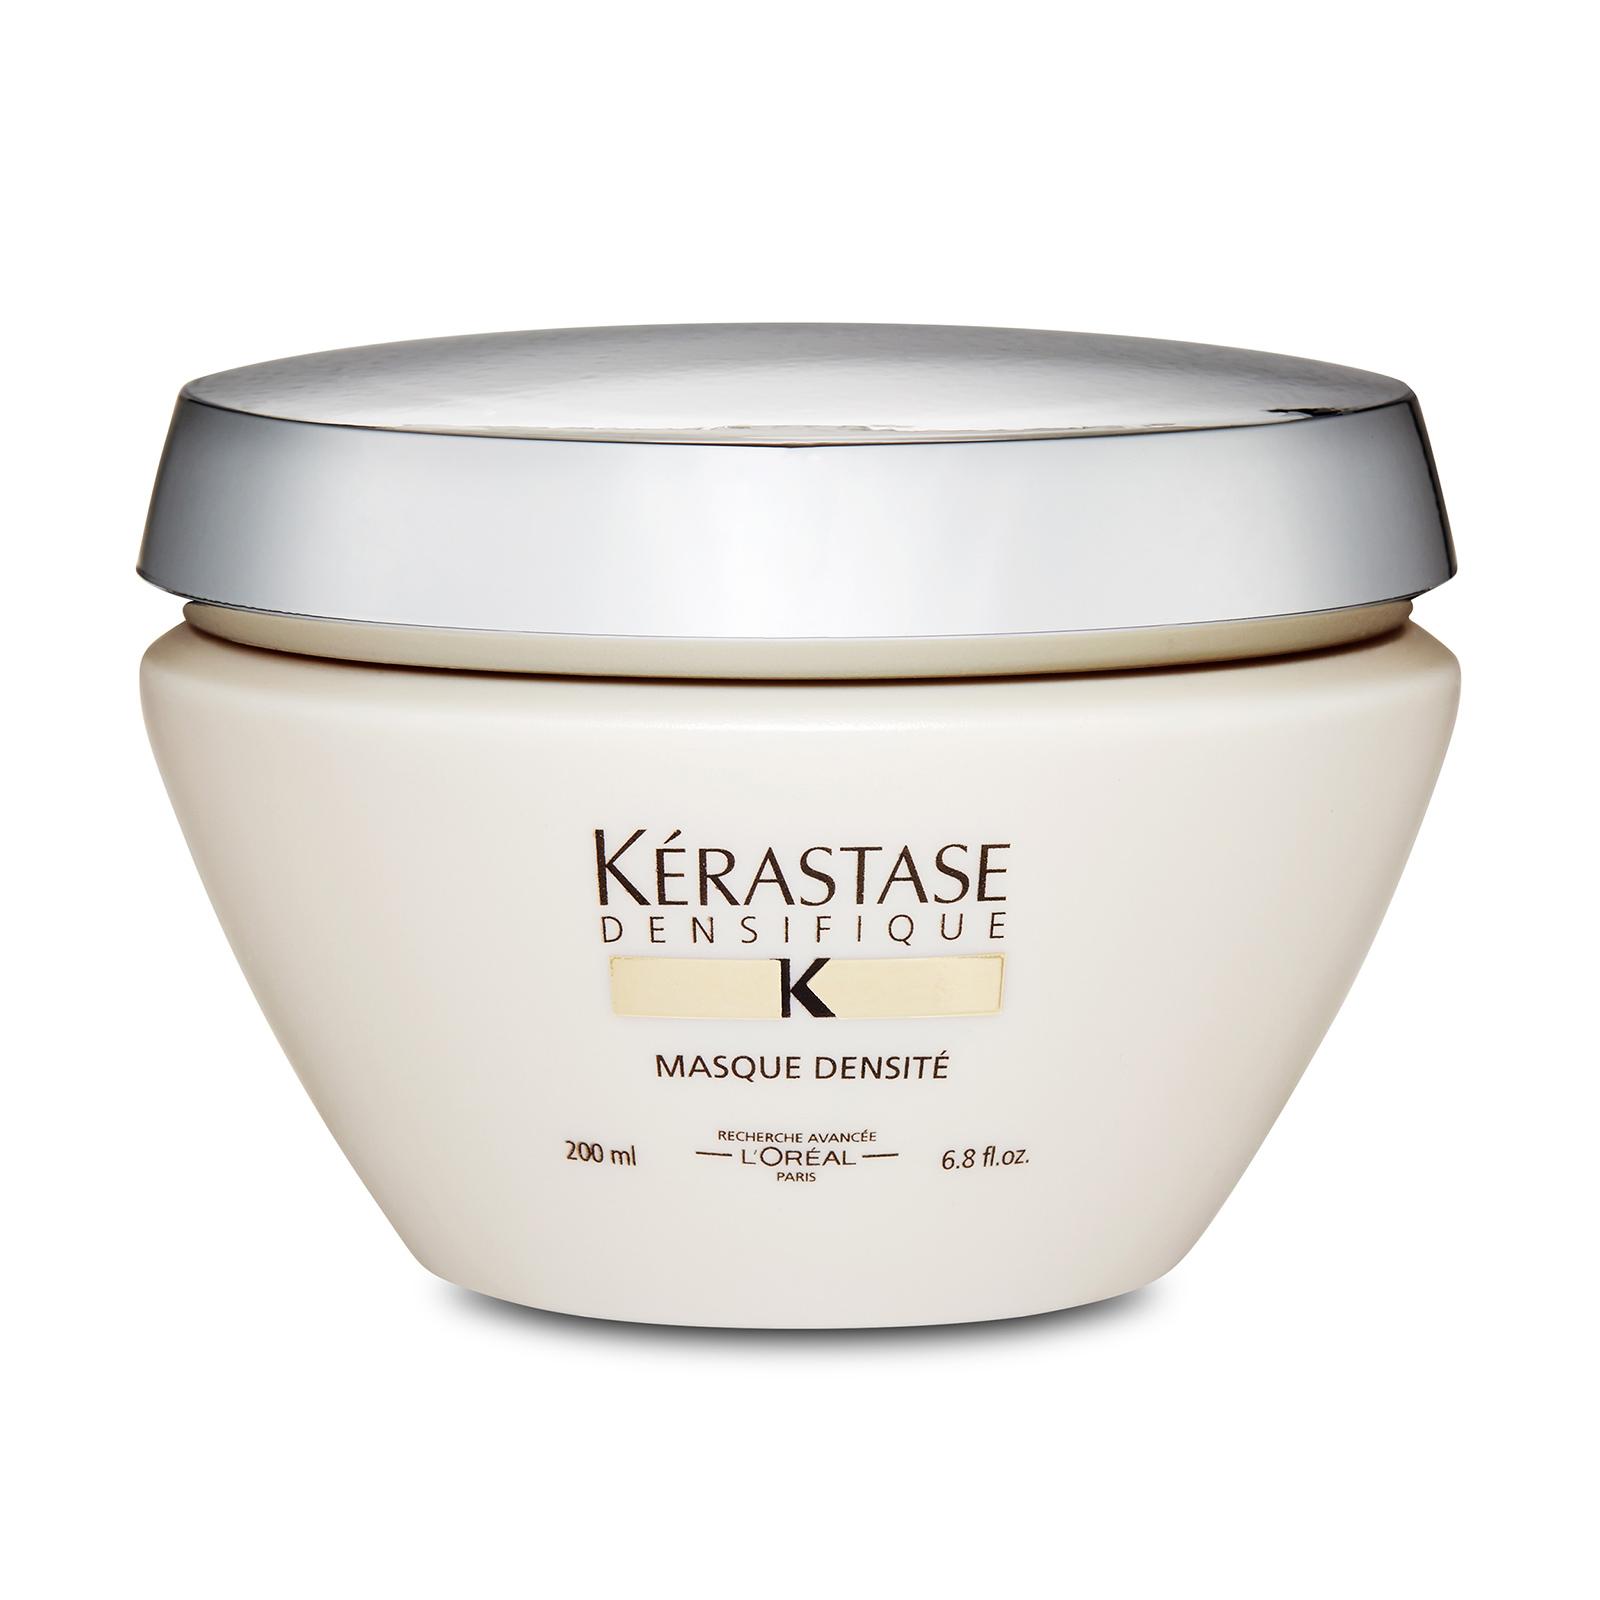 Kérastase Paris Densifique Masque Densite Replenishing Masque (For Hair Visibly Lacking Density) 6.8oz, 200ml